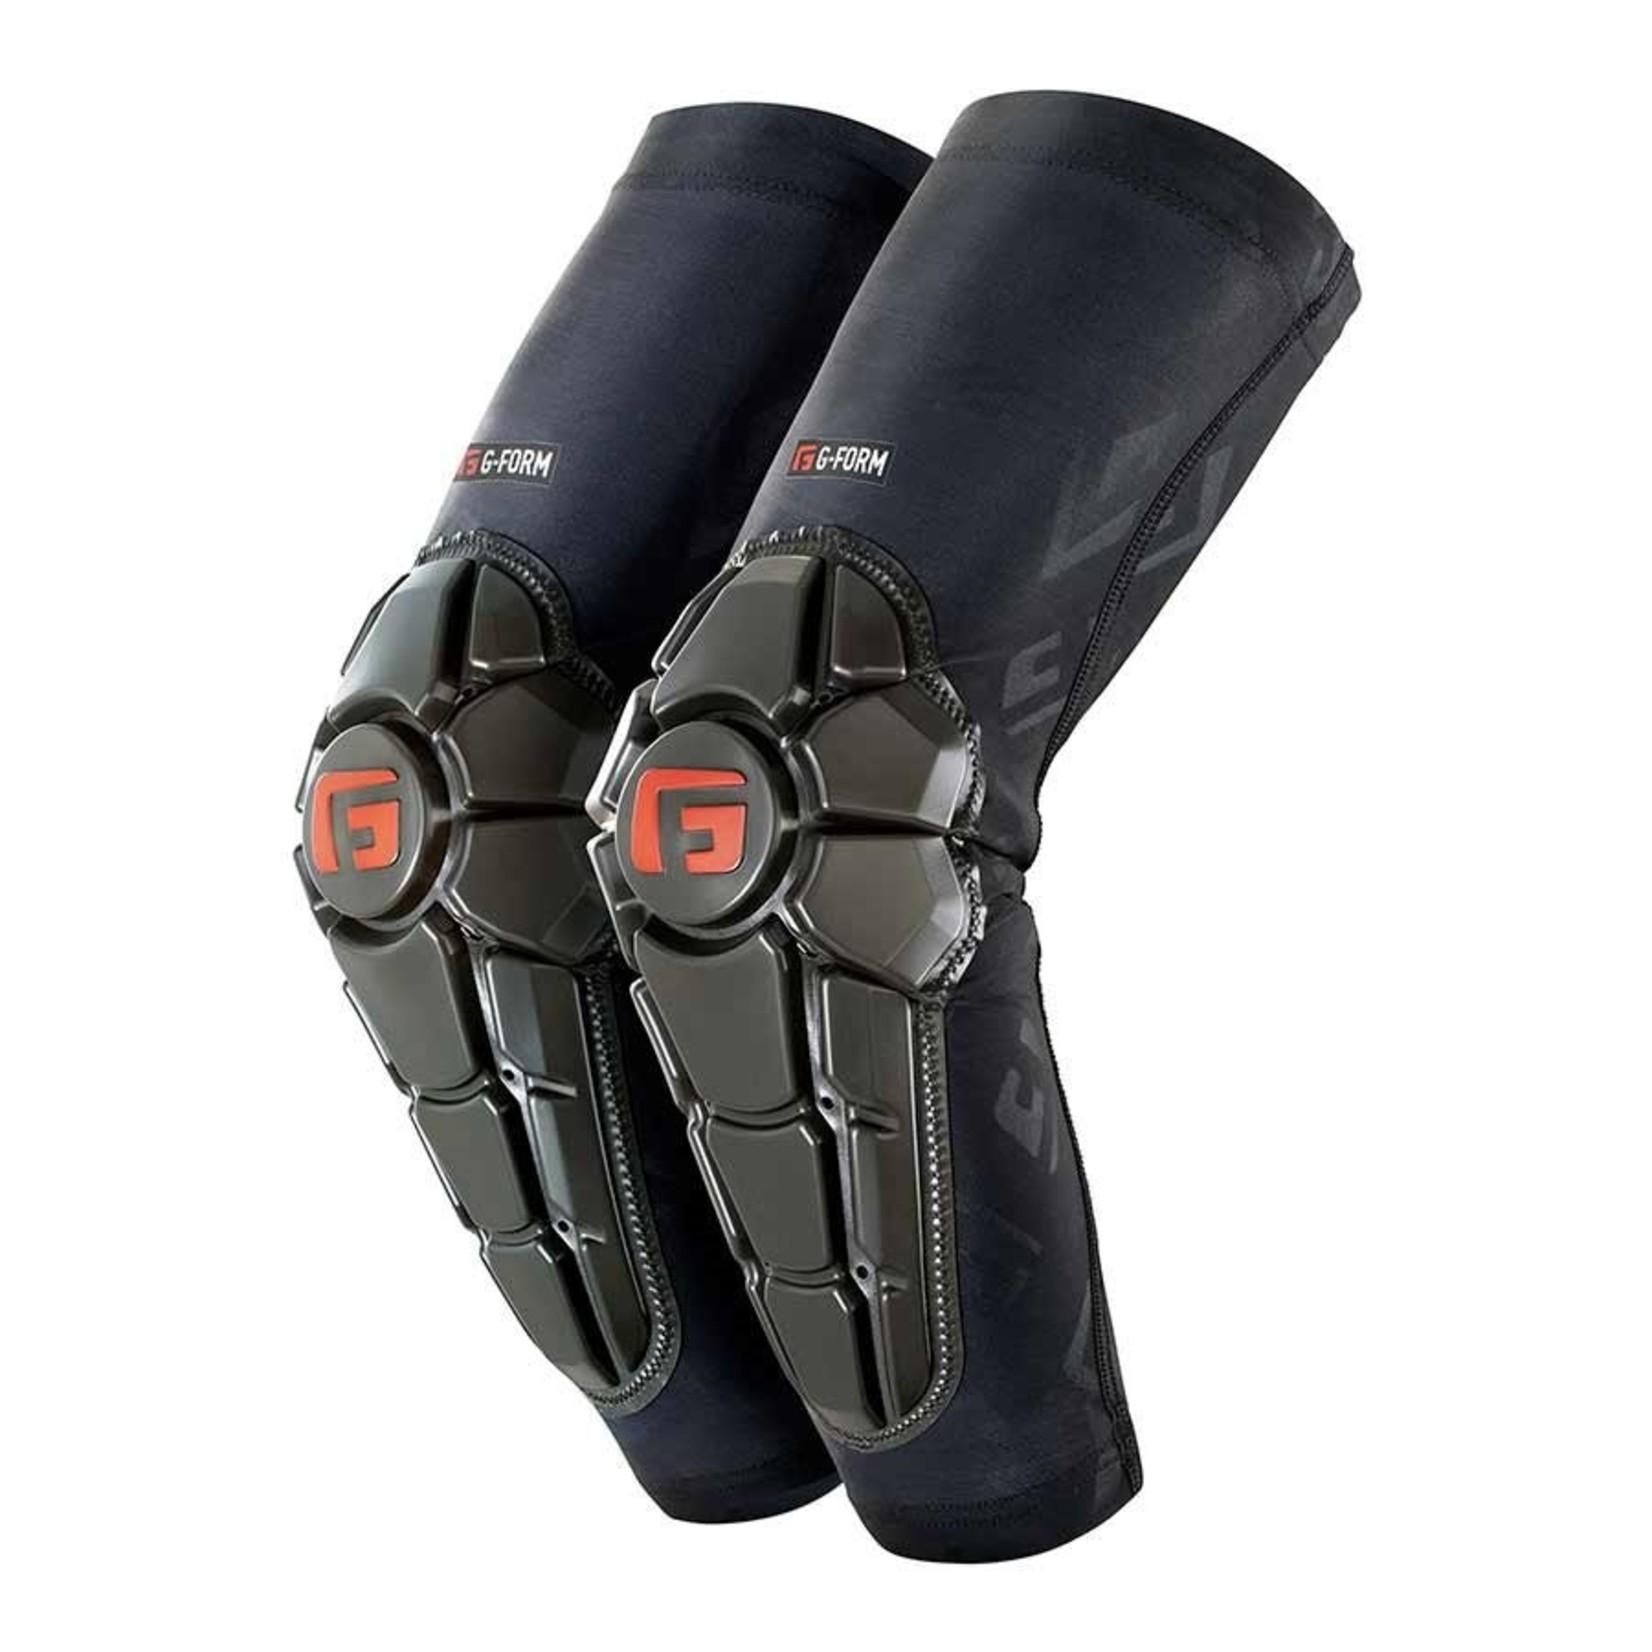 G-Form G-Form, Youth Pro-X2, Elbow/Forearm Guard, Black, SM, Set